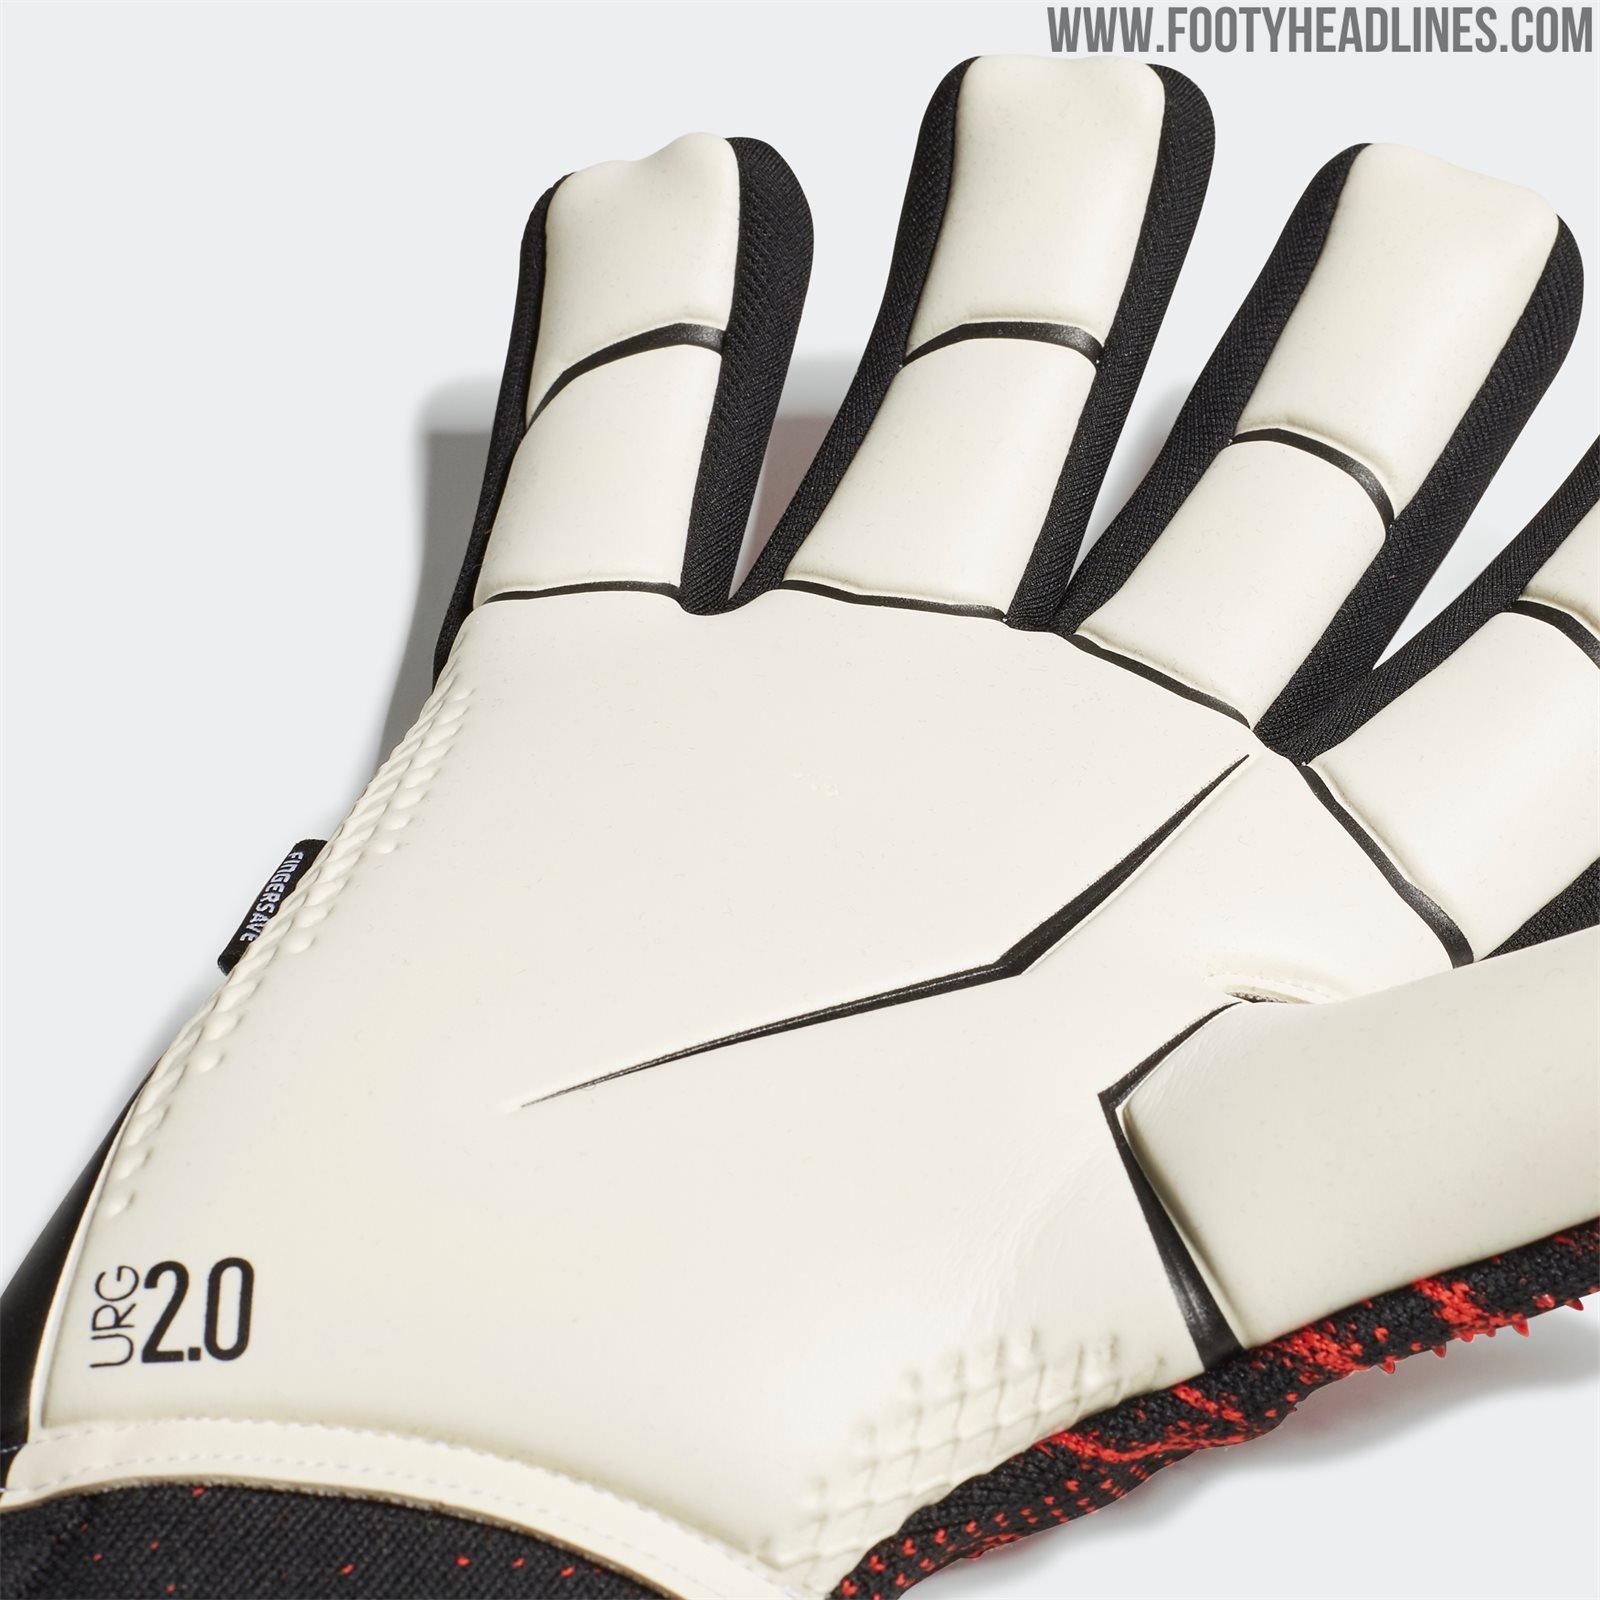 Găng tay Predator 20 Pro Fingersave